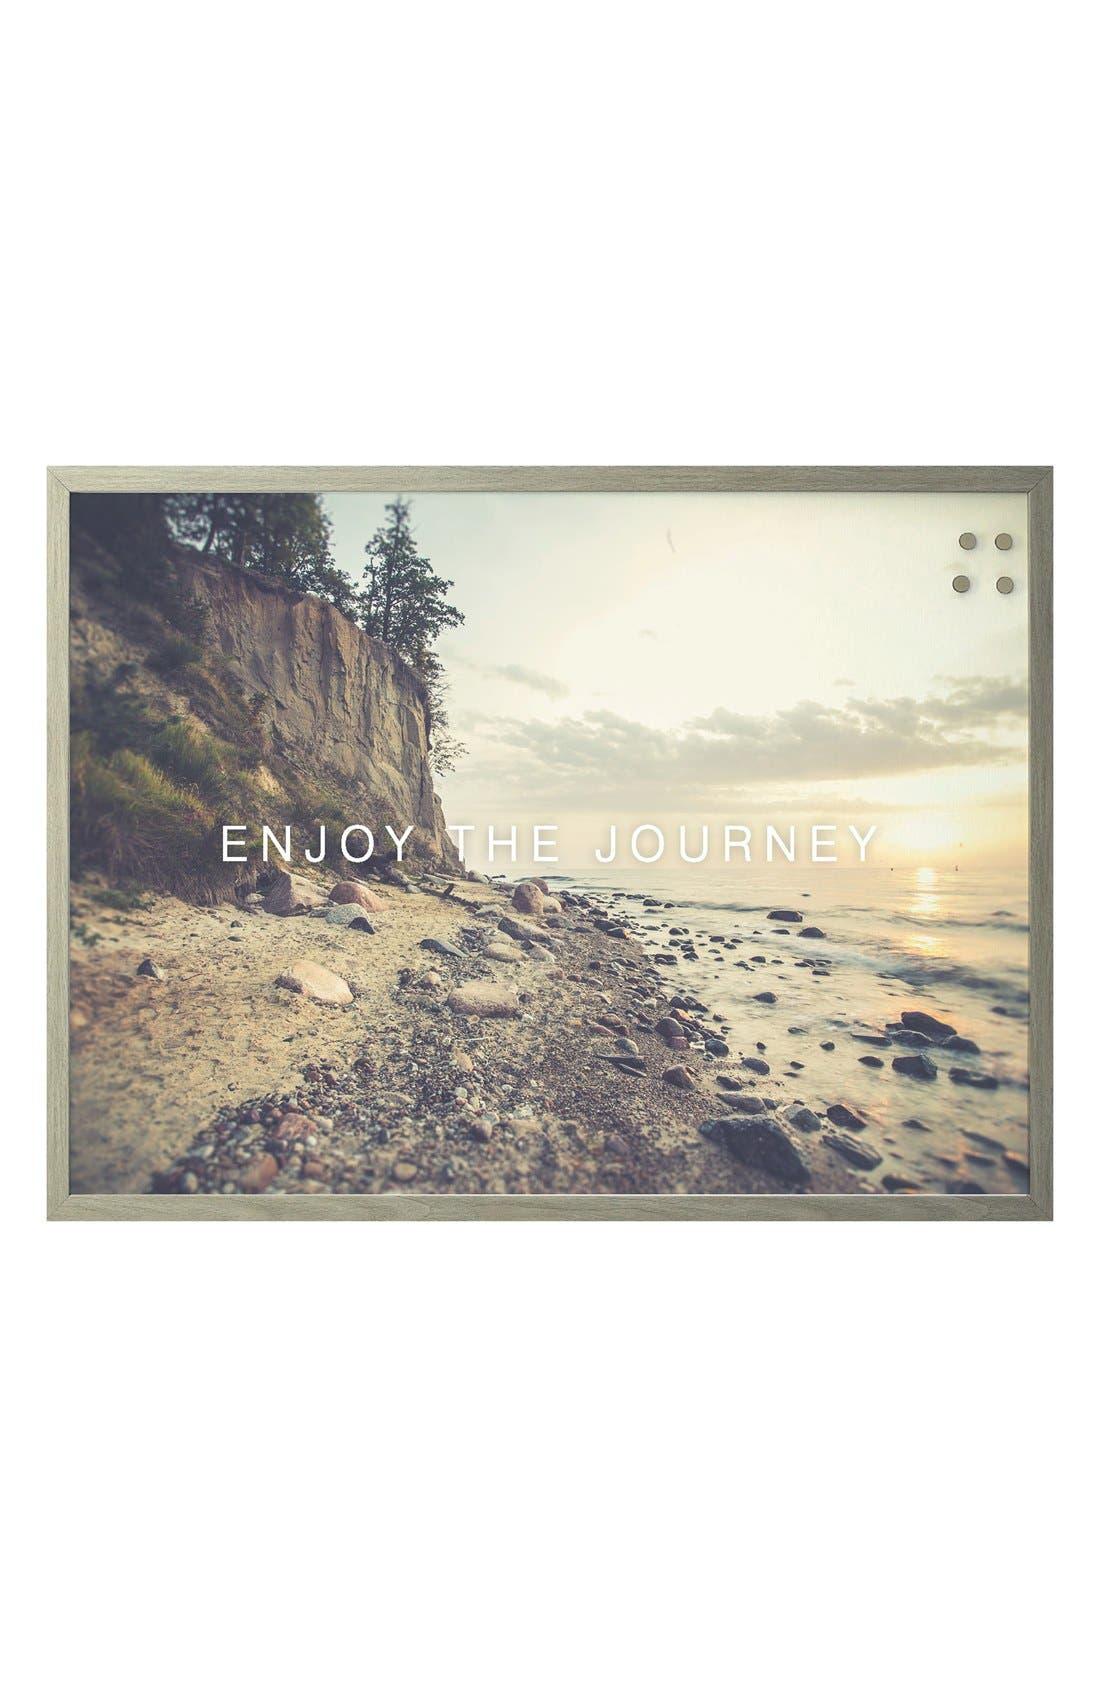 'Enjoy the Journey' Magnet Board,                             Main thumbnail 1, color,                             200